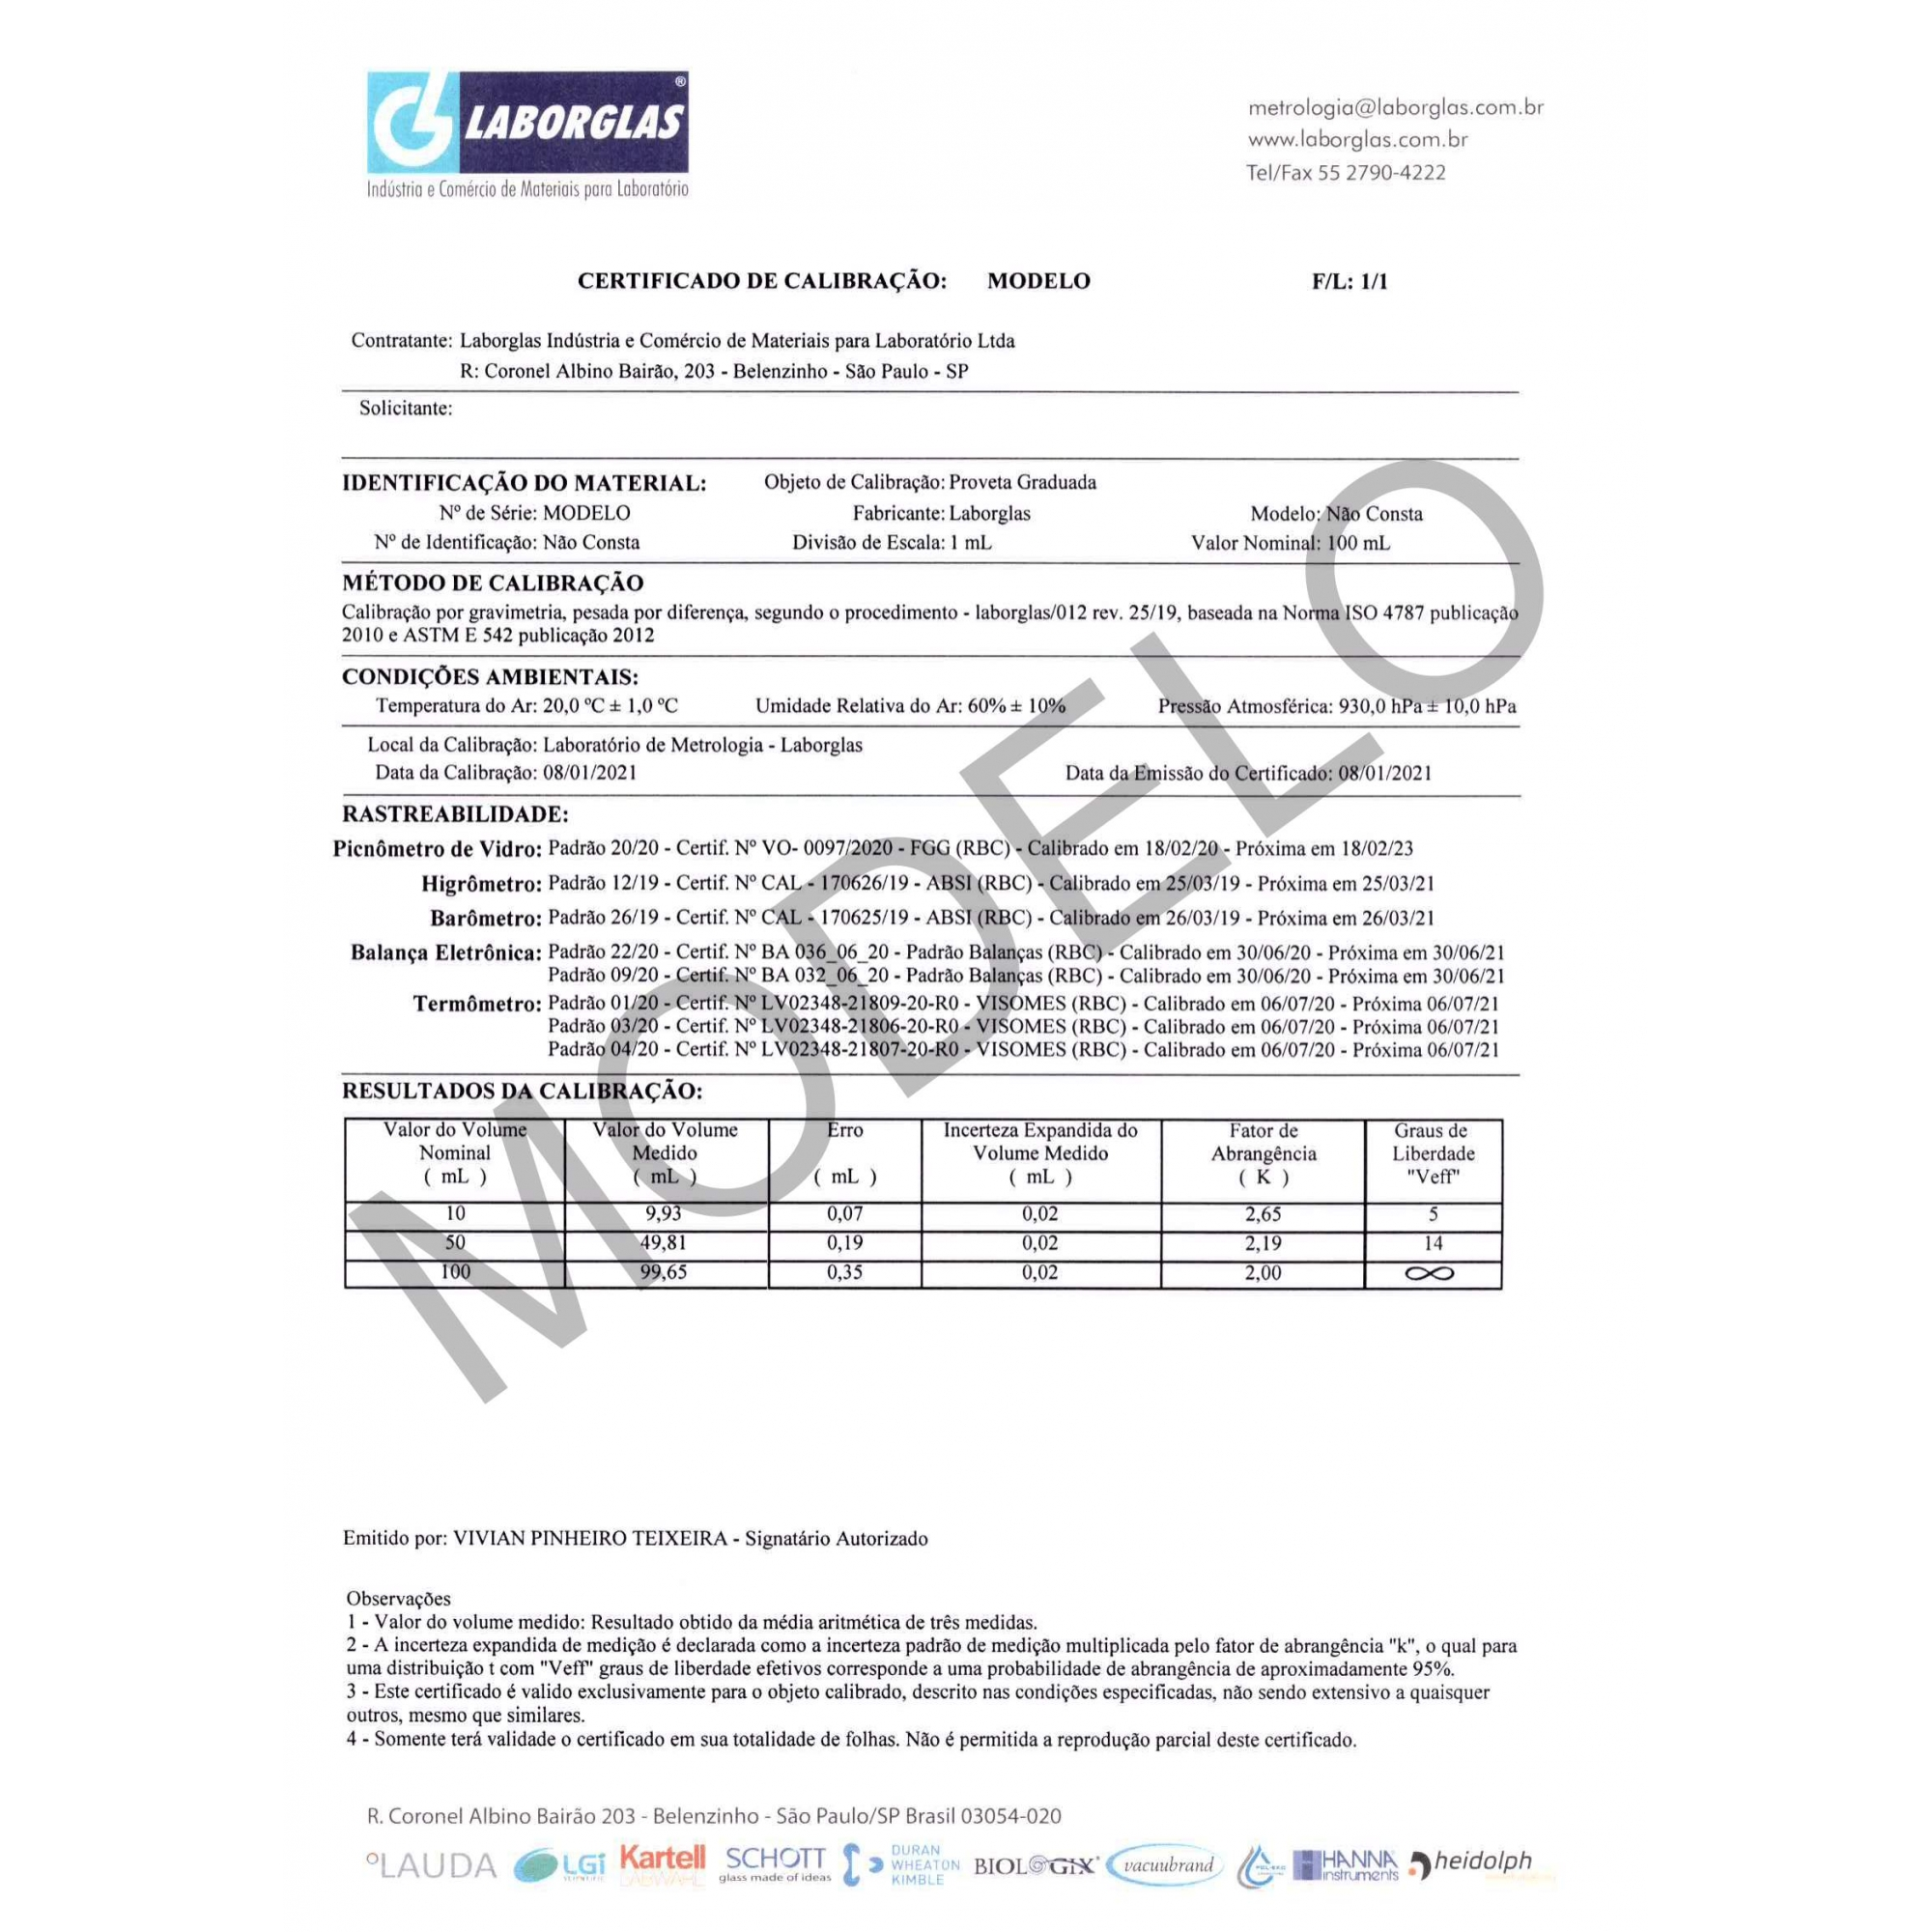 PROVETA GRADUADA BASE HEXAGONAL DE POLIPROPILENO 30 ML CLASSE A CERTIFICADO RASTREÁVEL - Laborglas - Cód. 9138715-C